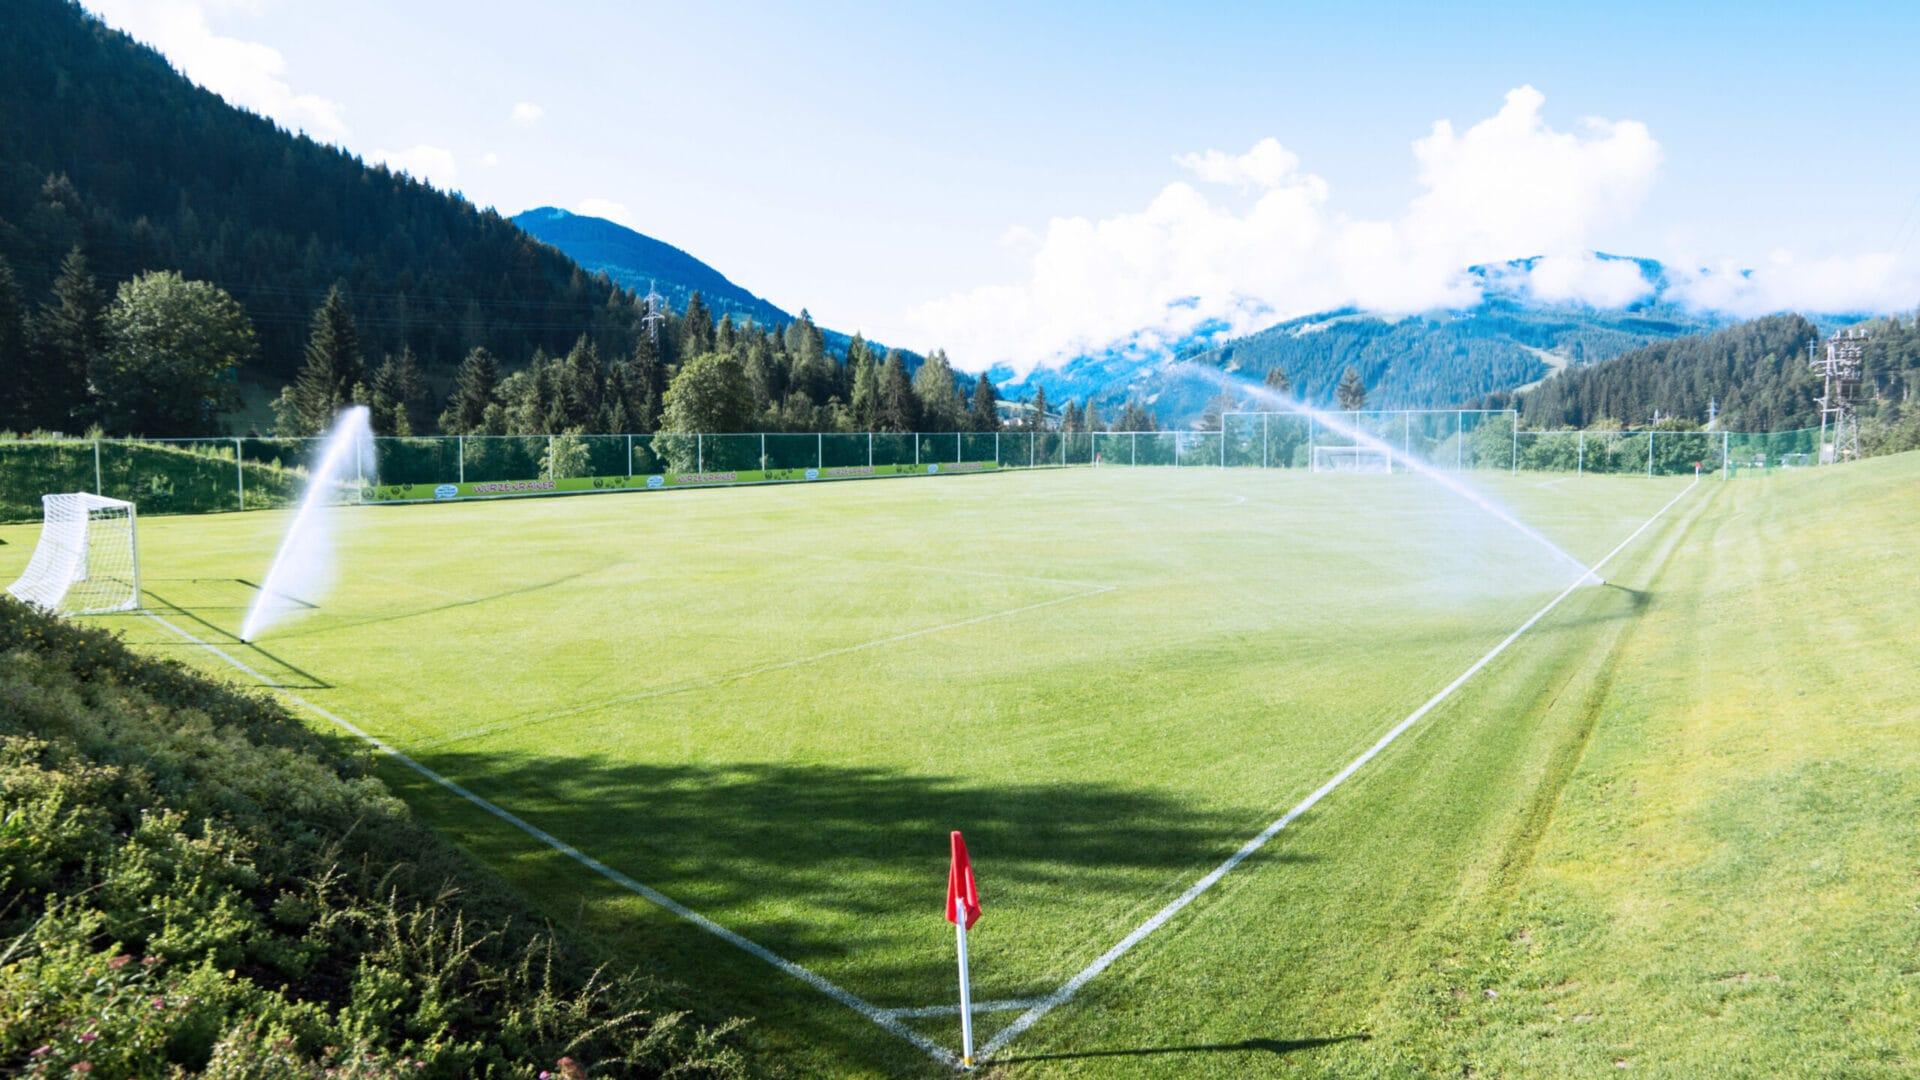 Hofgut-apartment-lifestyle-resort-wagrain-erleben-im-Hofgut-fuer-Sportler-Fussballplatz